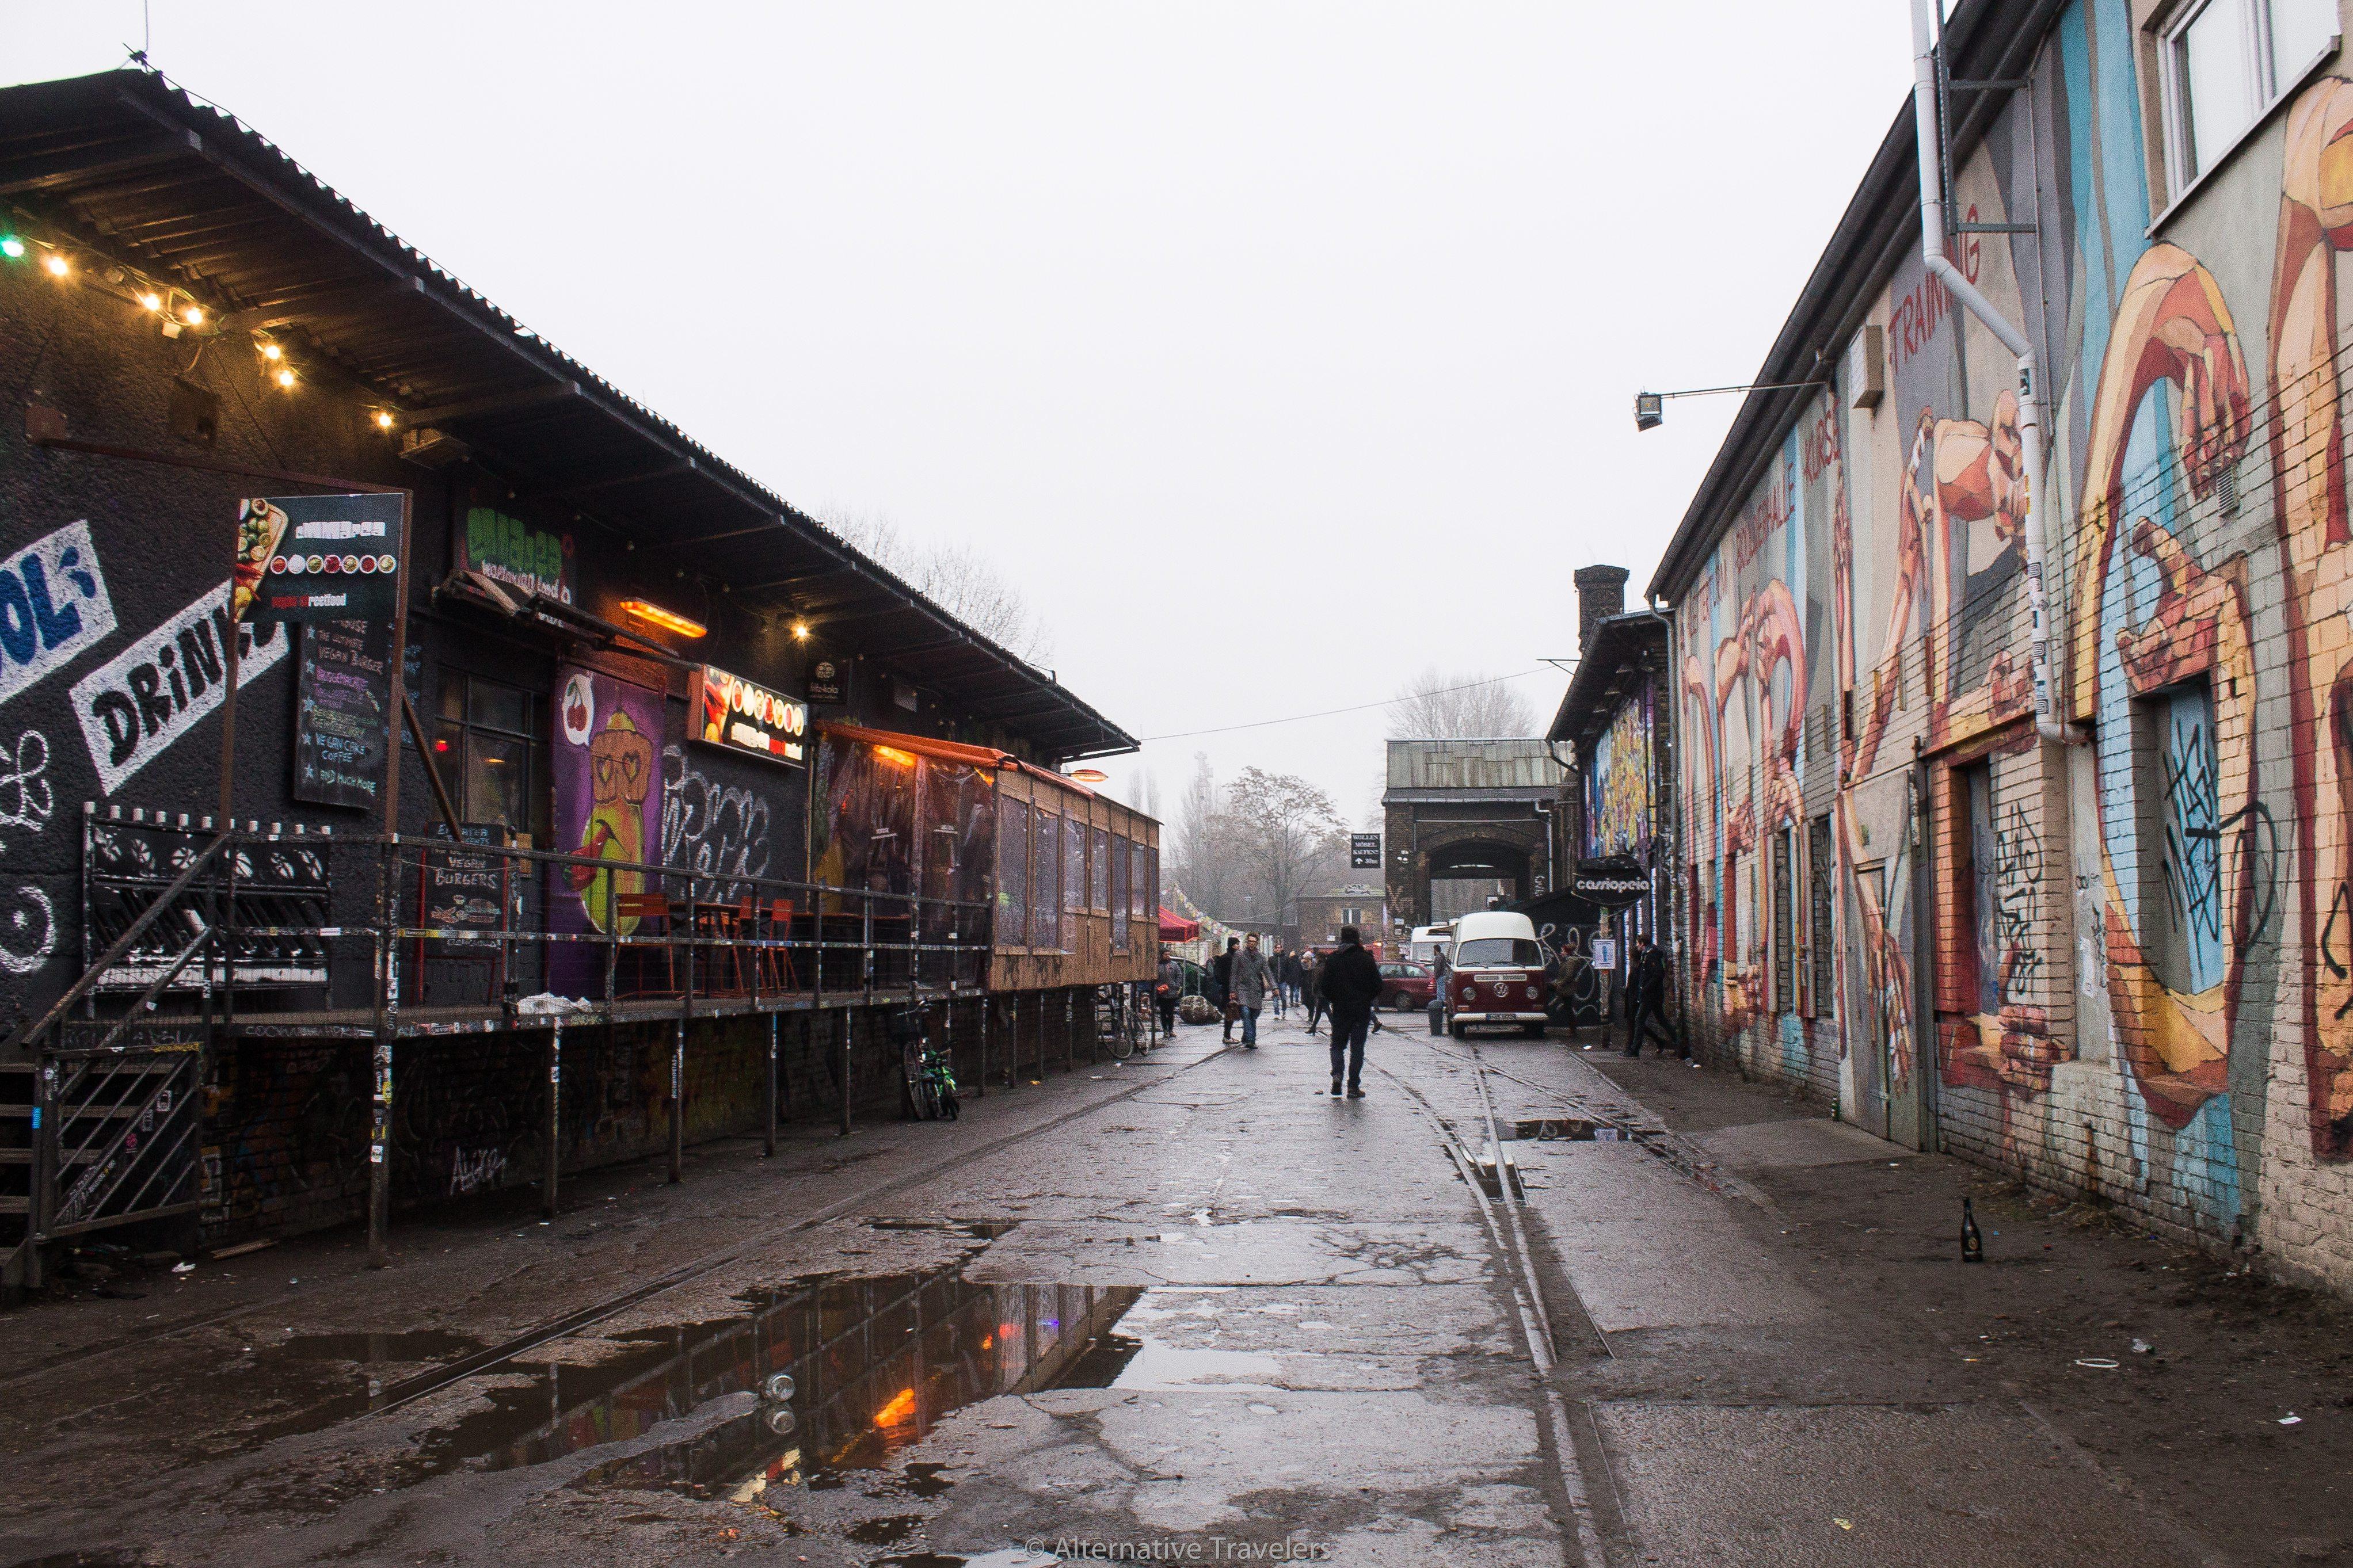 RAW Gelande - Unusual Berlin | AlternativeTravelers.com